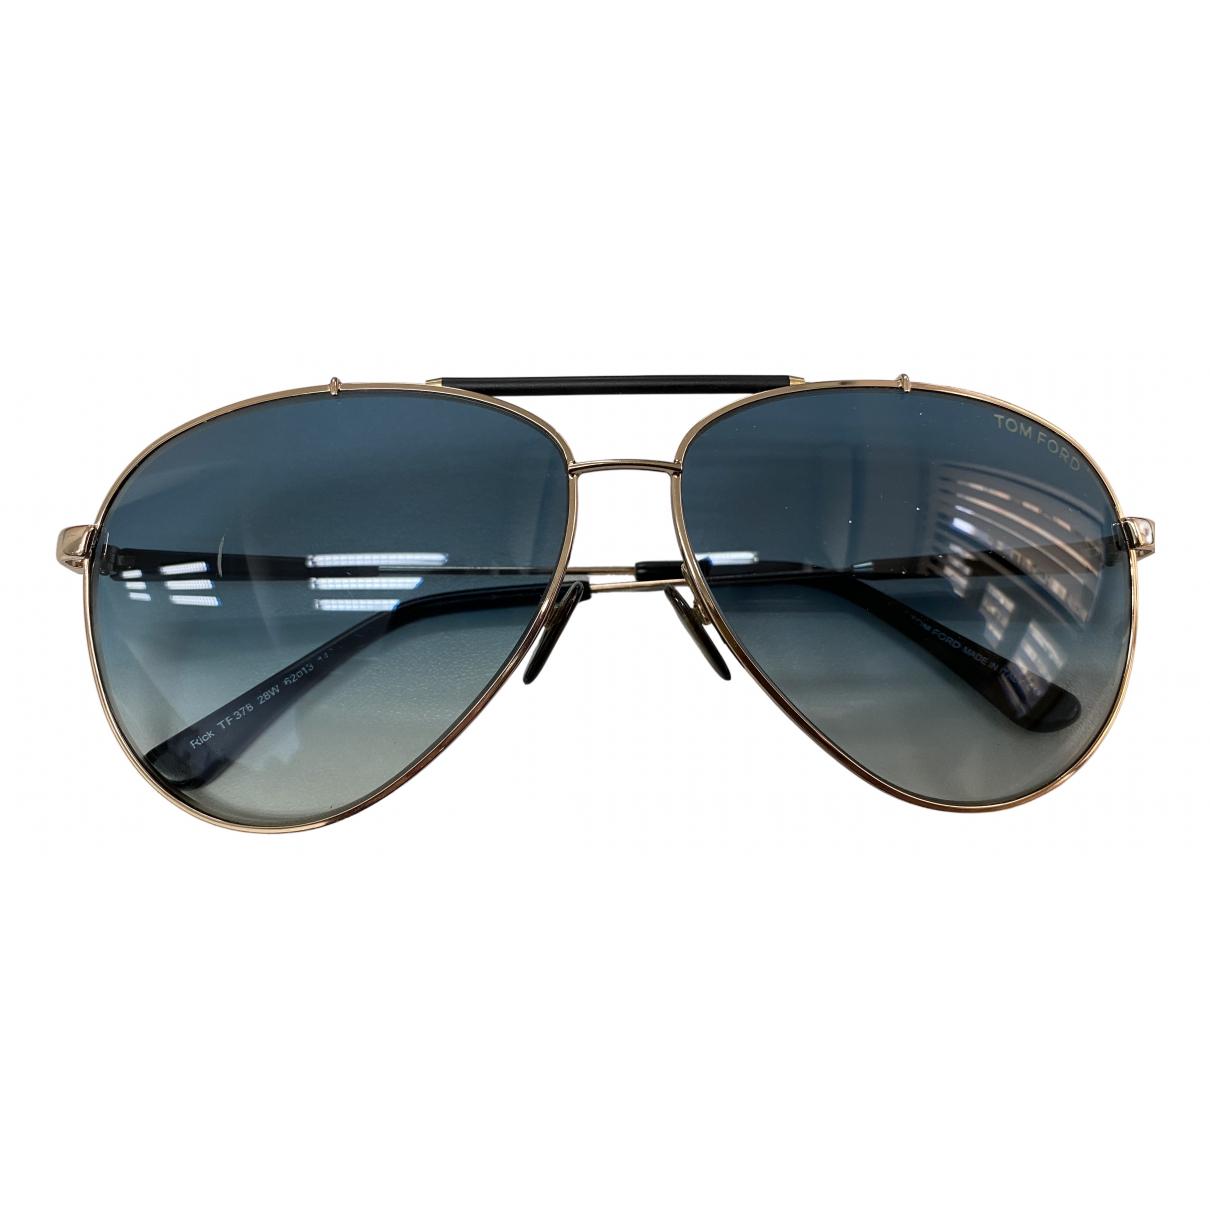 Tom Ford N Blue Metal Sunglasses for Men